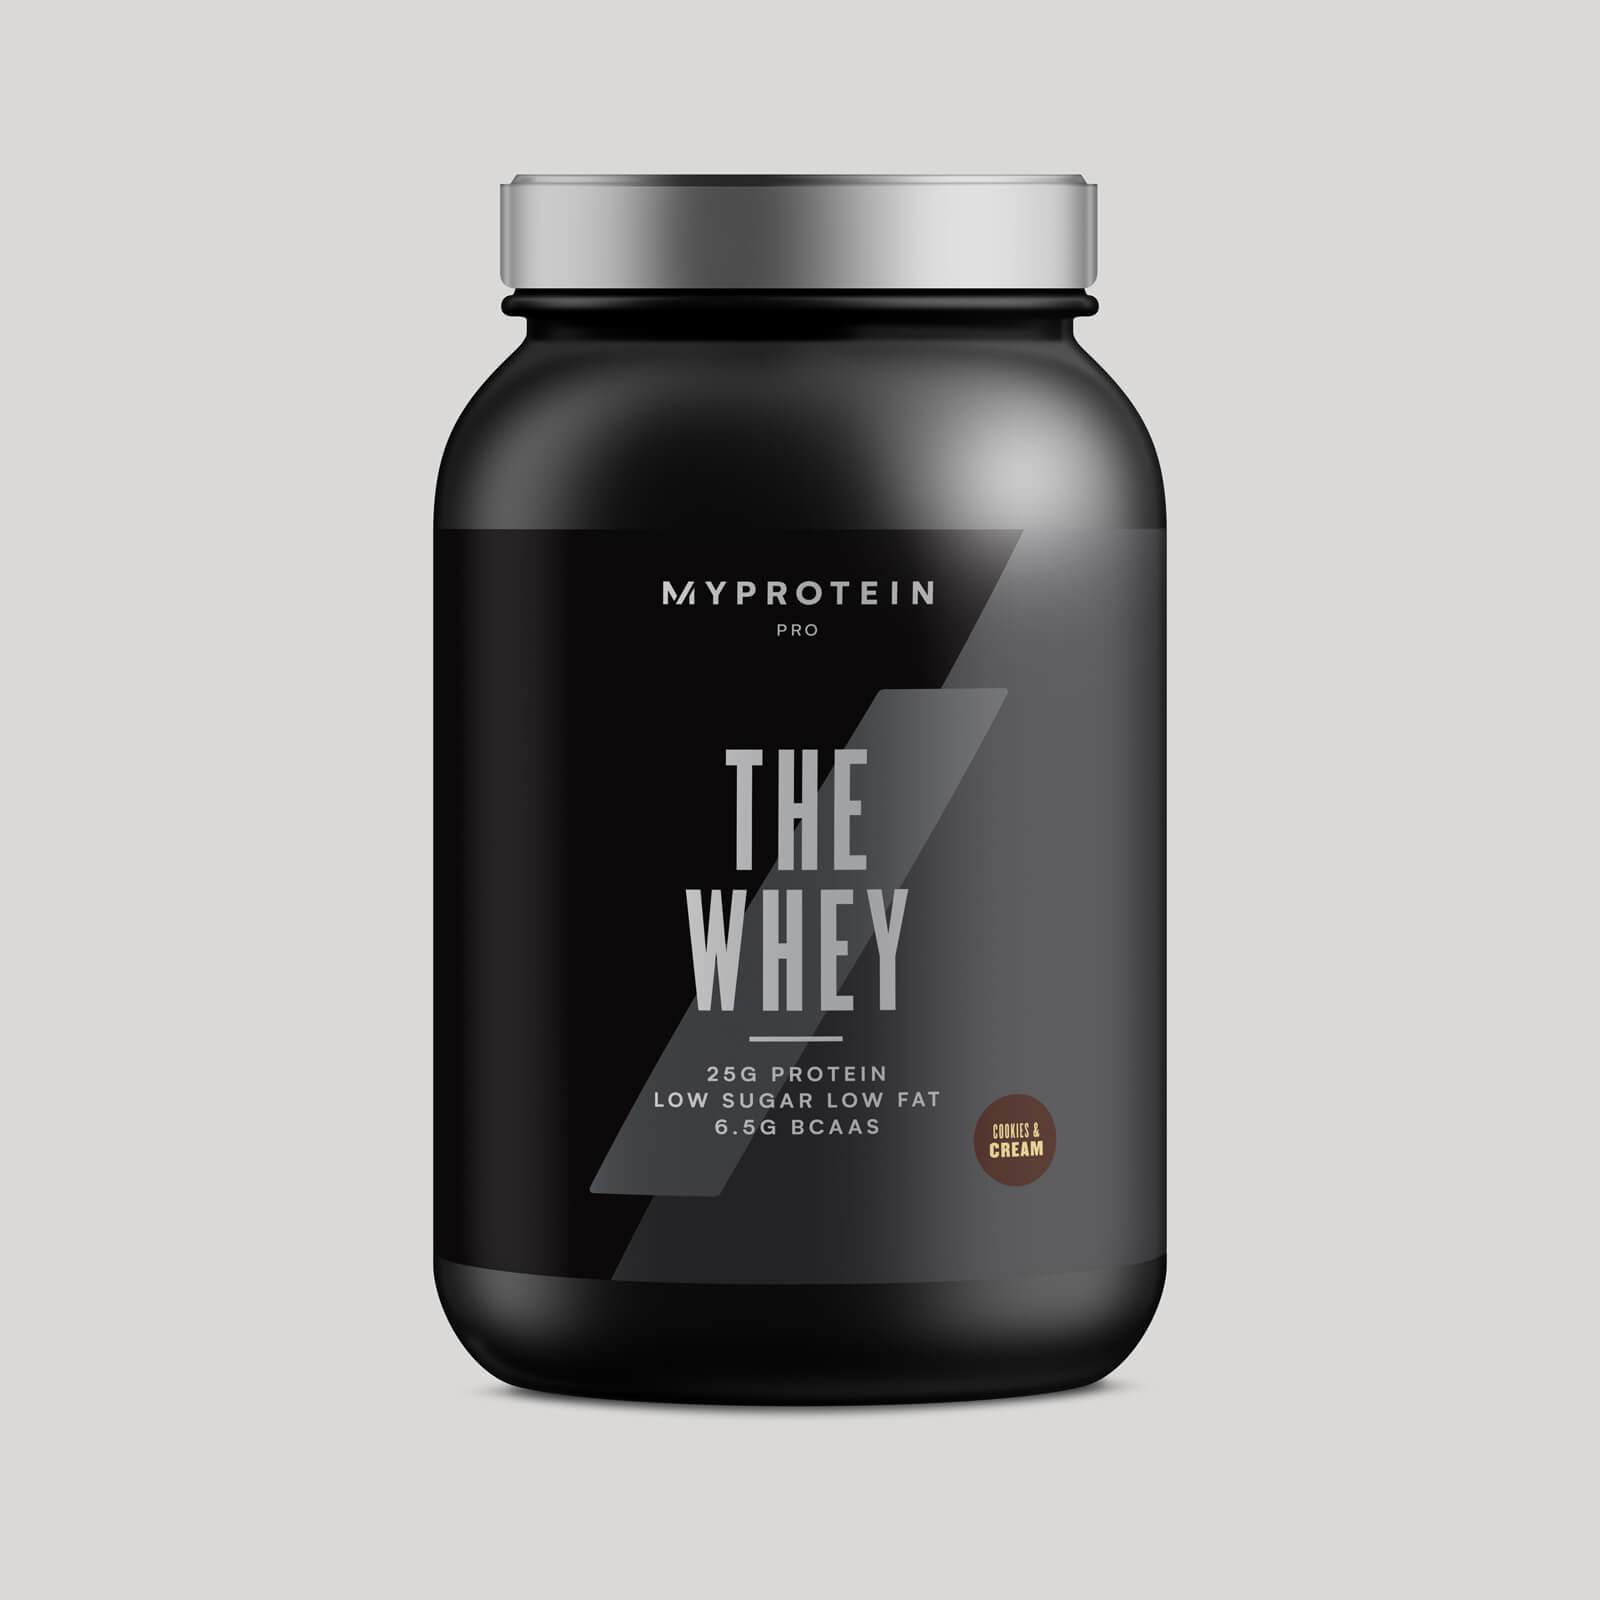 Myprotein THE Whey - 30 Servings - 900g - Cookies n